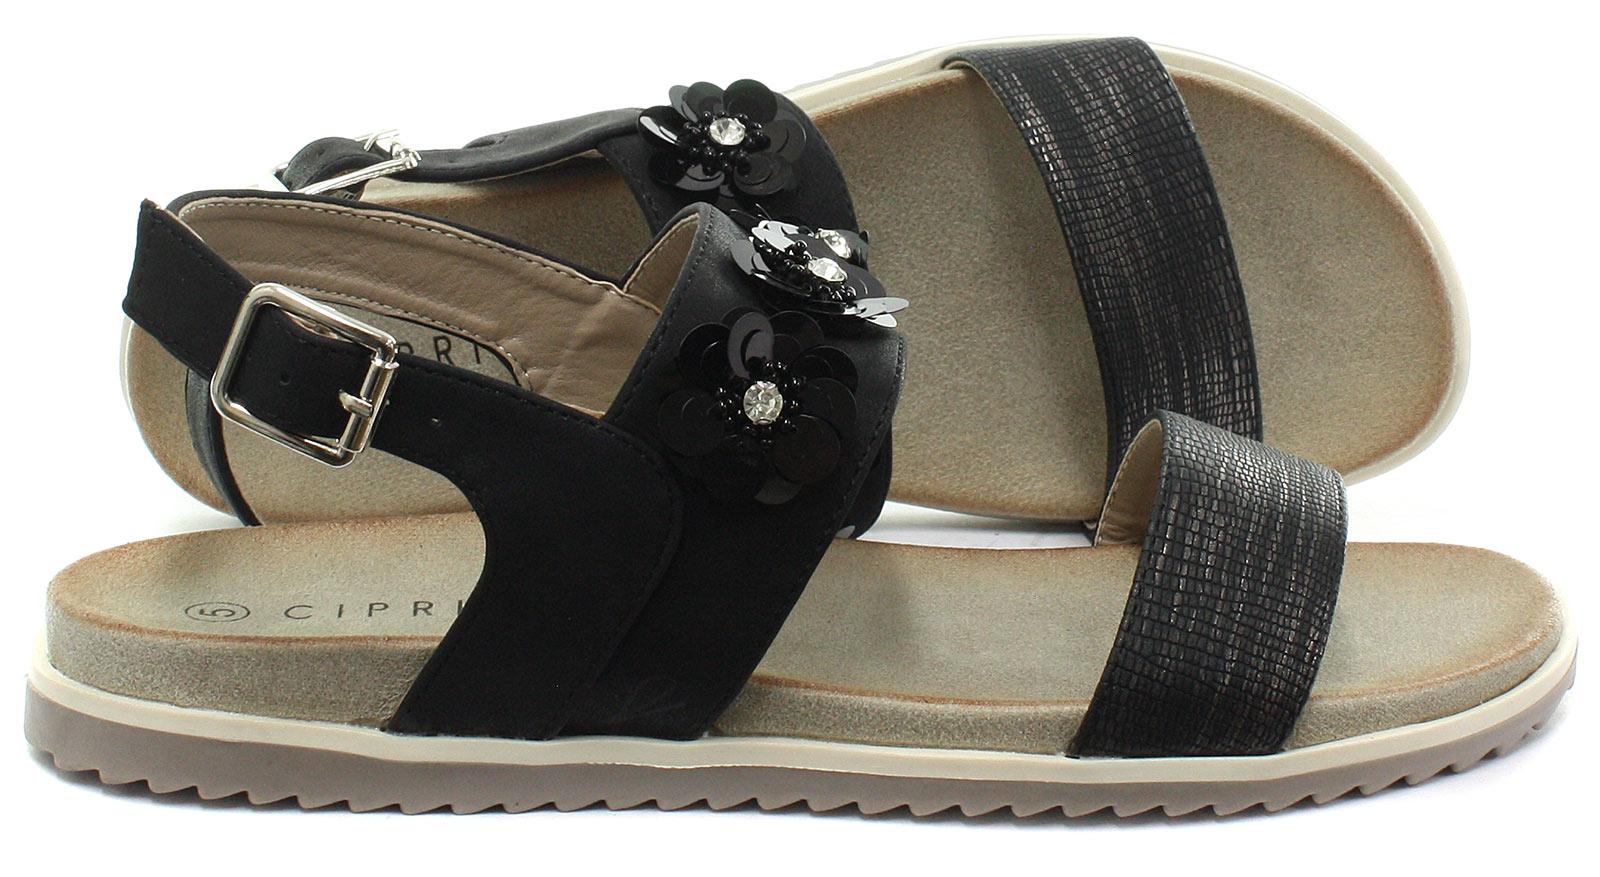 New-Cipriata-Angela-Black-Reptile-Print-Flower-Womens-Sandals-ALL-SIZES miniature 3